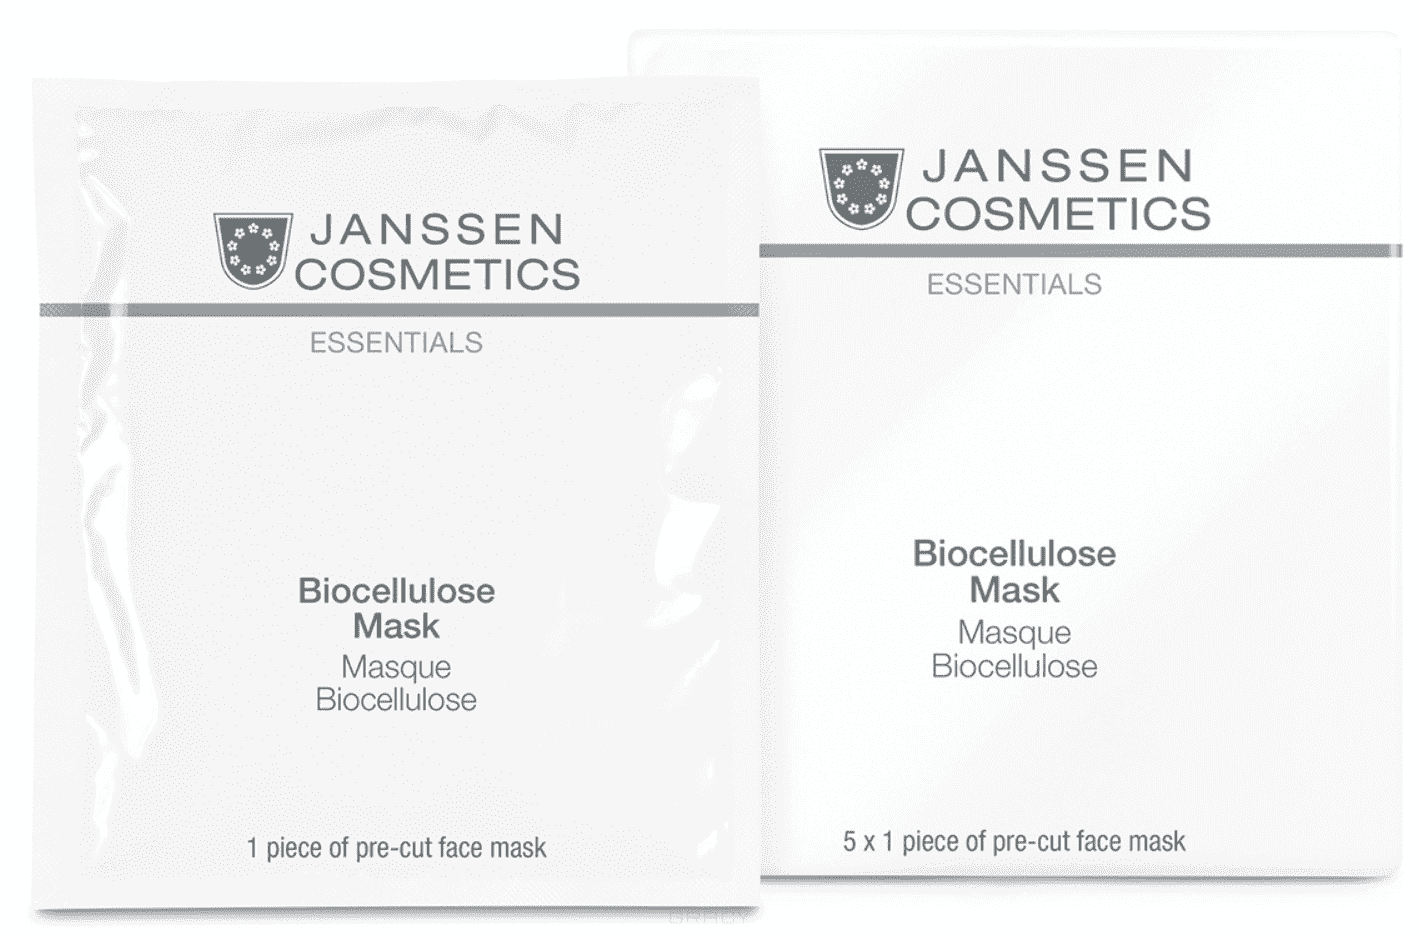 Janssen, Интенсивно-увлажняющая лифтинг маска Biocellulose Mask, 1 шт маска janssen cosmetics collagen pure mask 1 шт